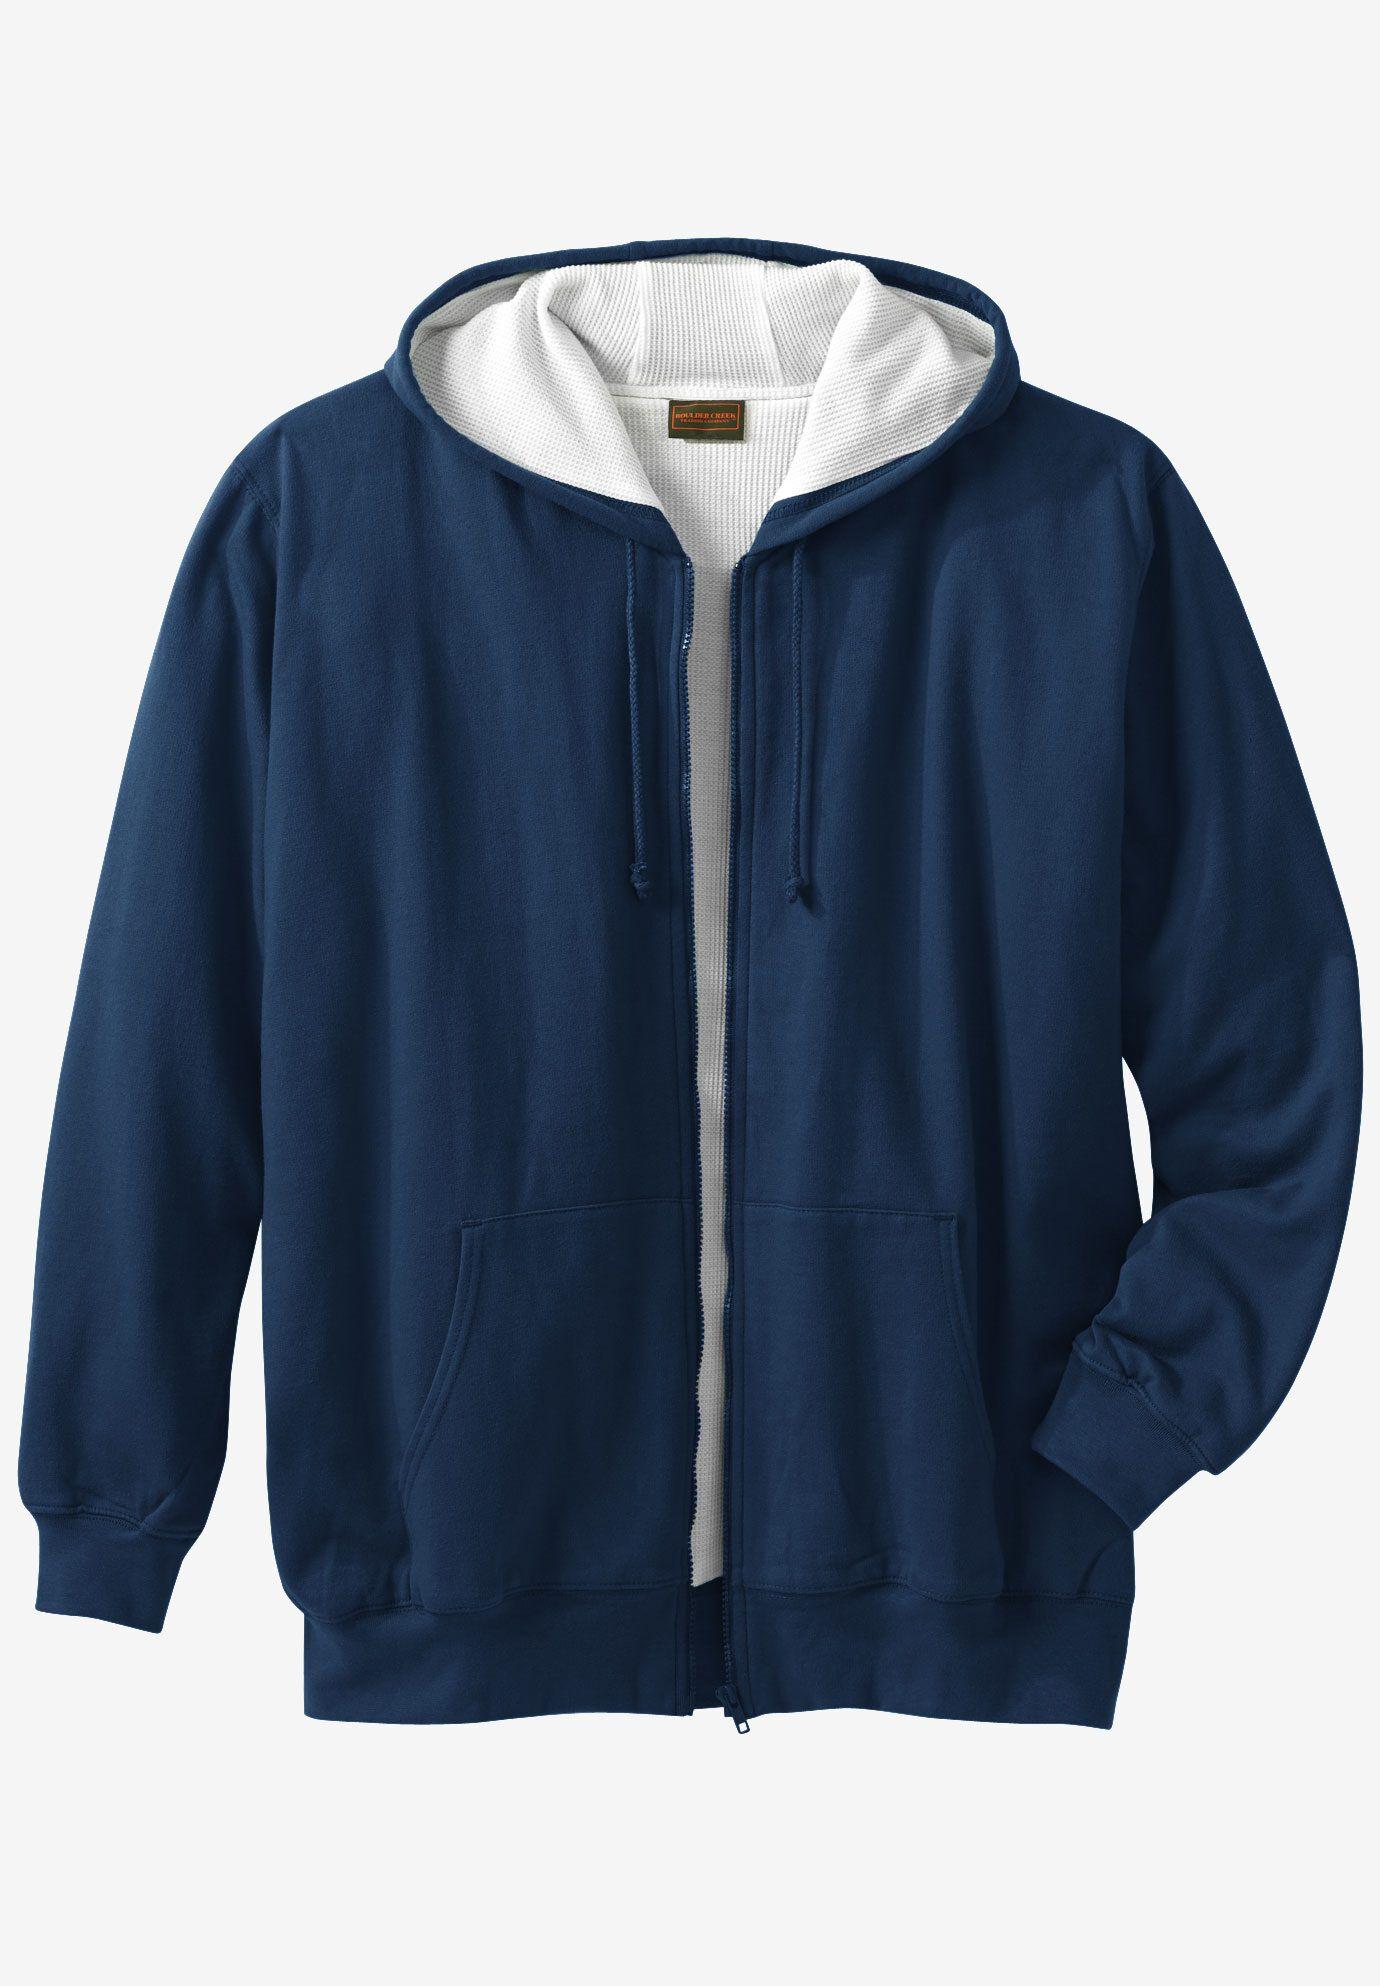 Big and Tall Hoodies & Sweatshirts for Men (to 4XL plus) | King Size  hot sale iinK9Ql3